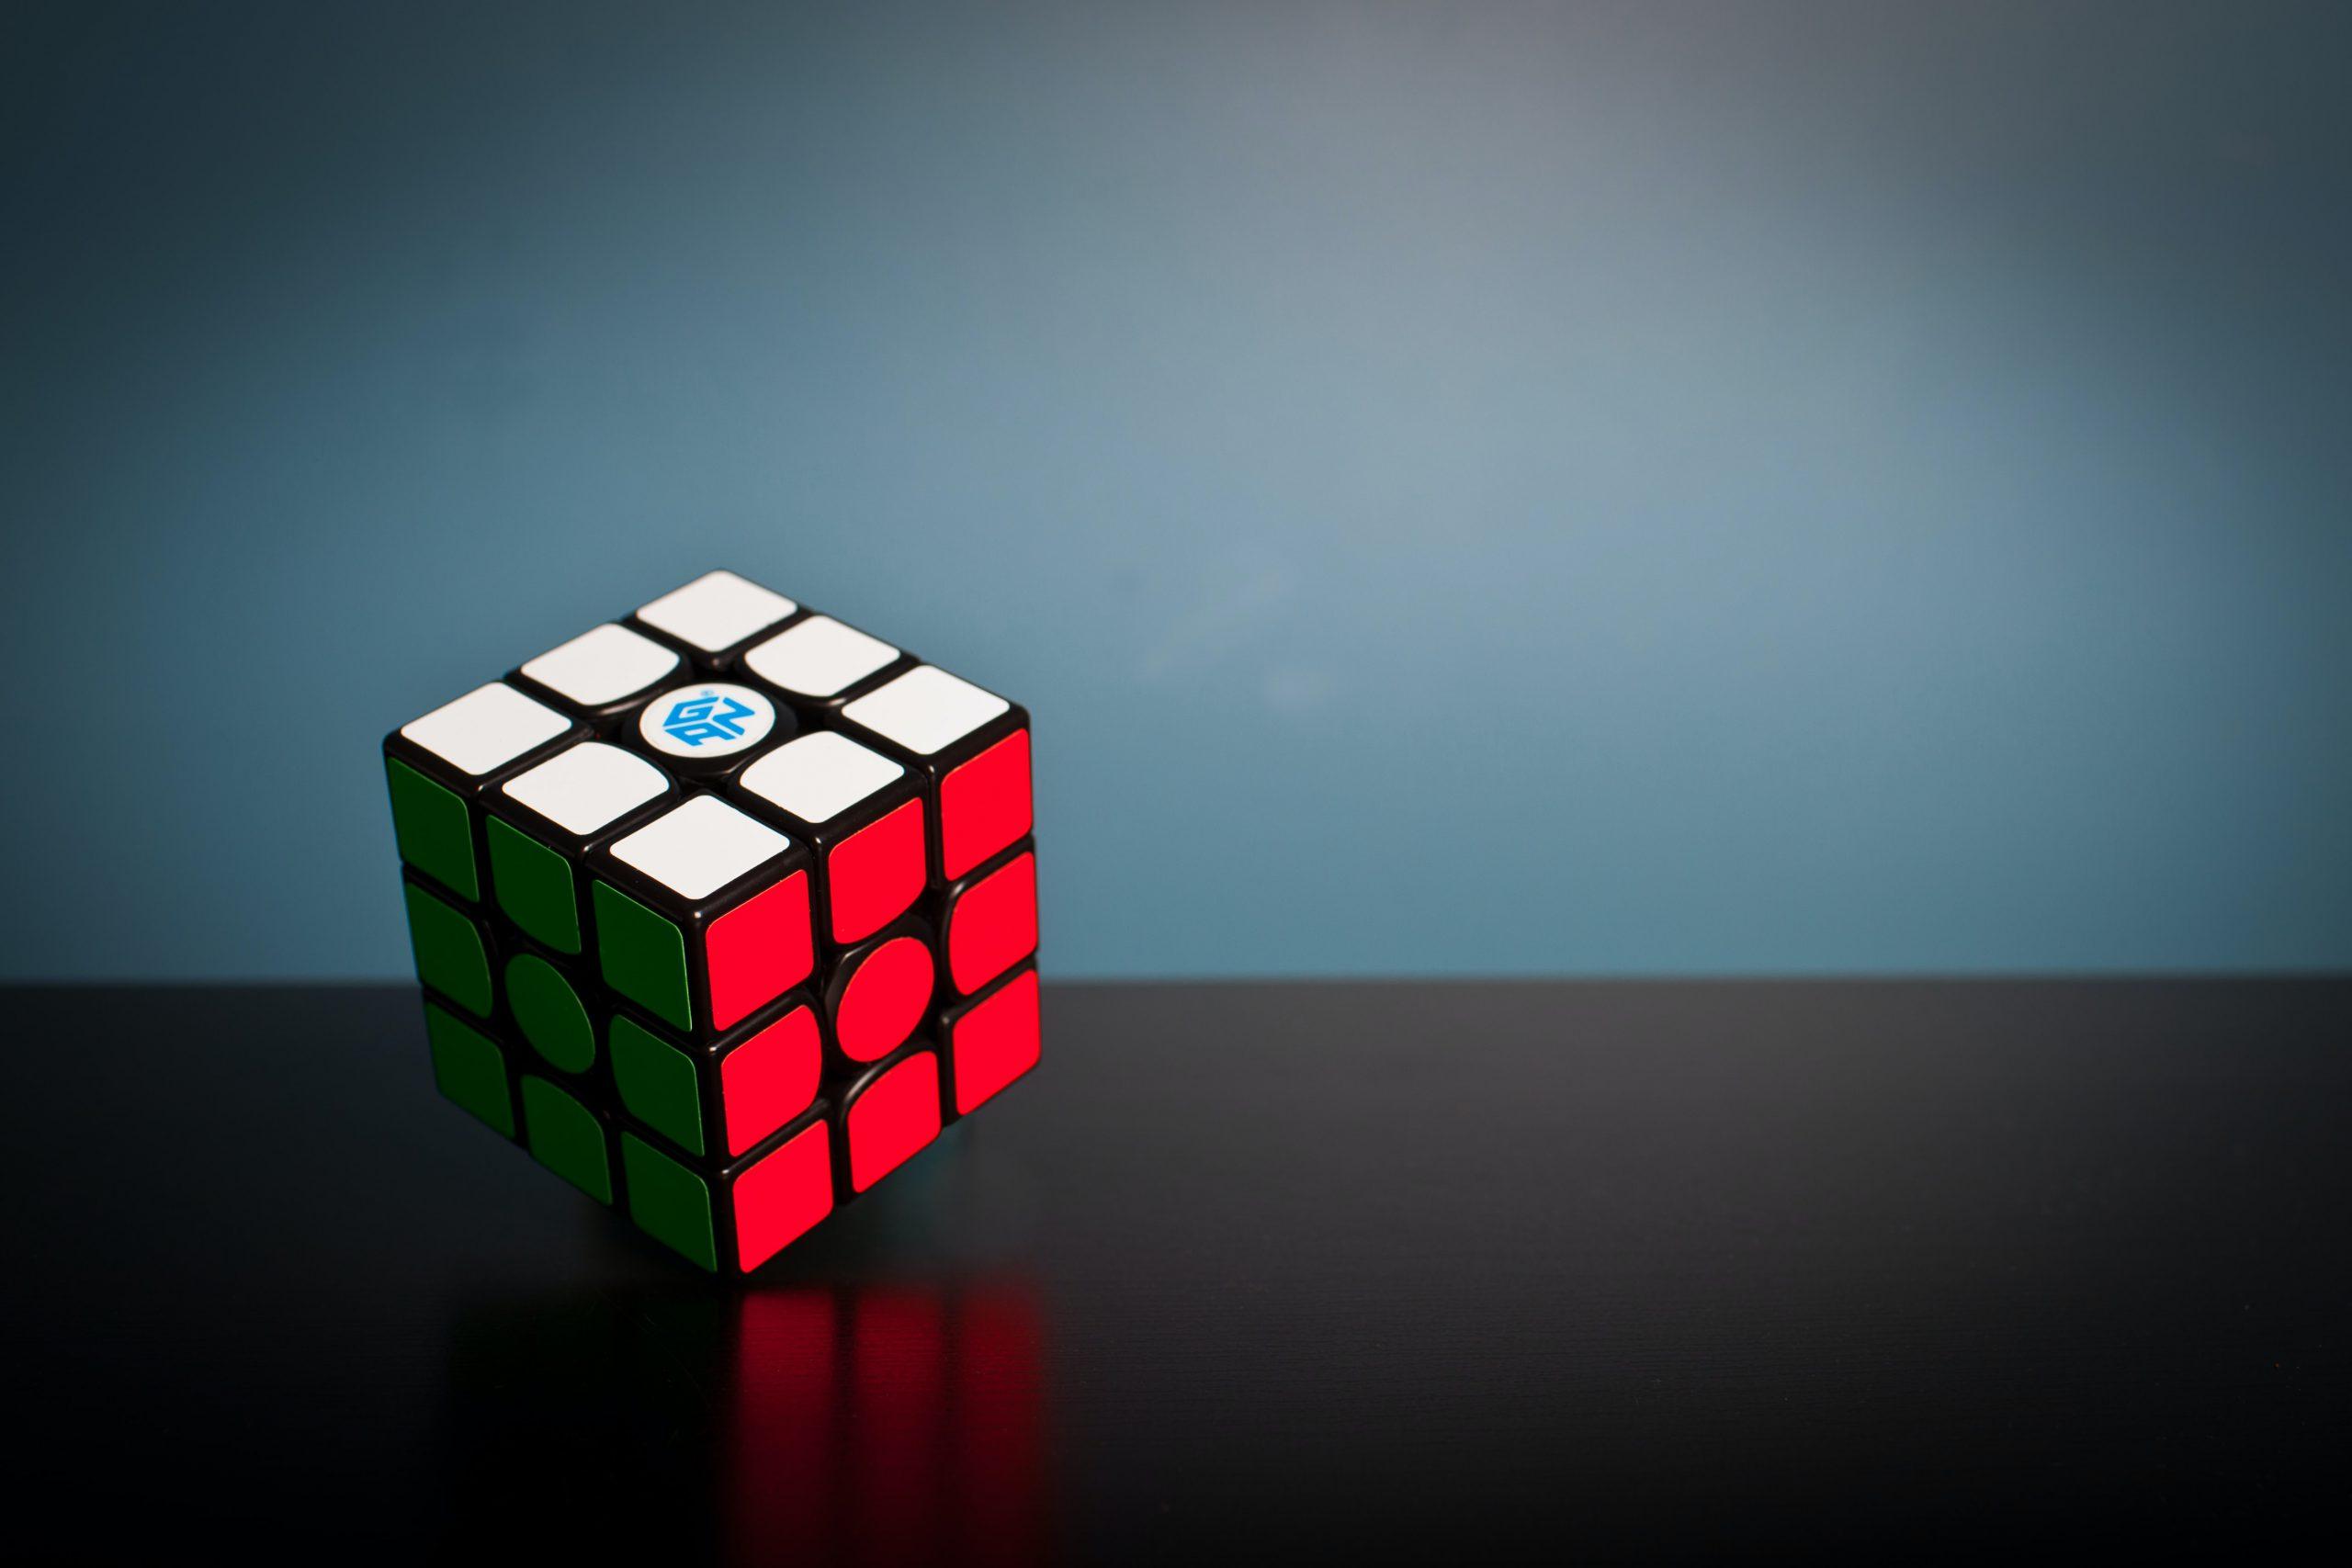 Soluciones en Common Data Services de 0 a 100